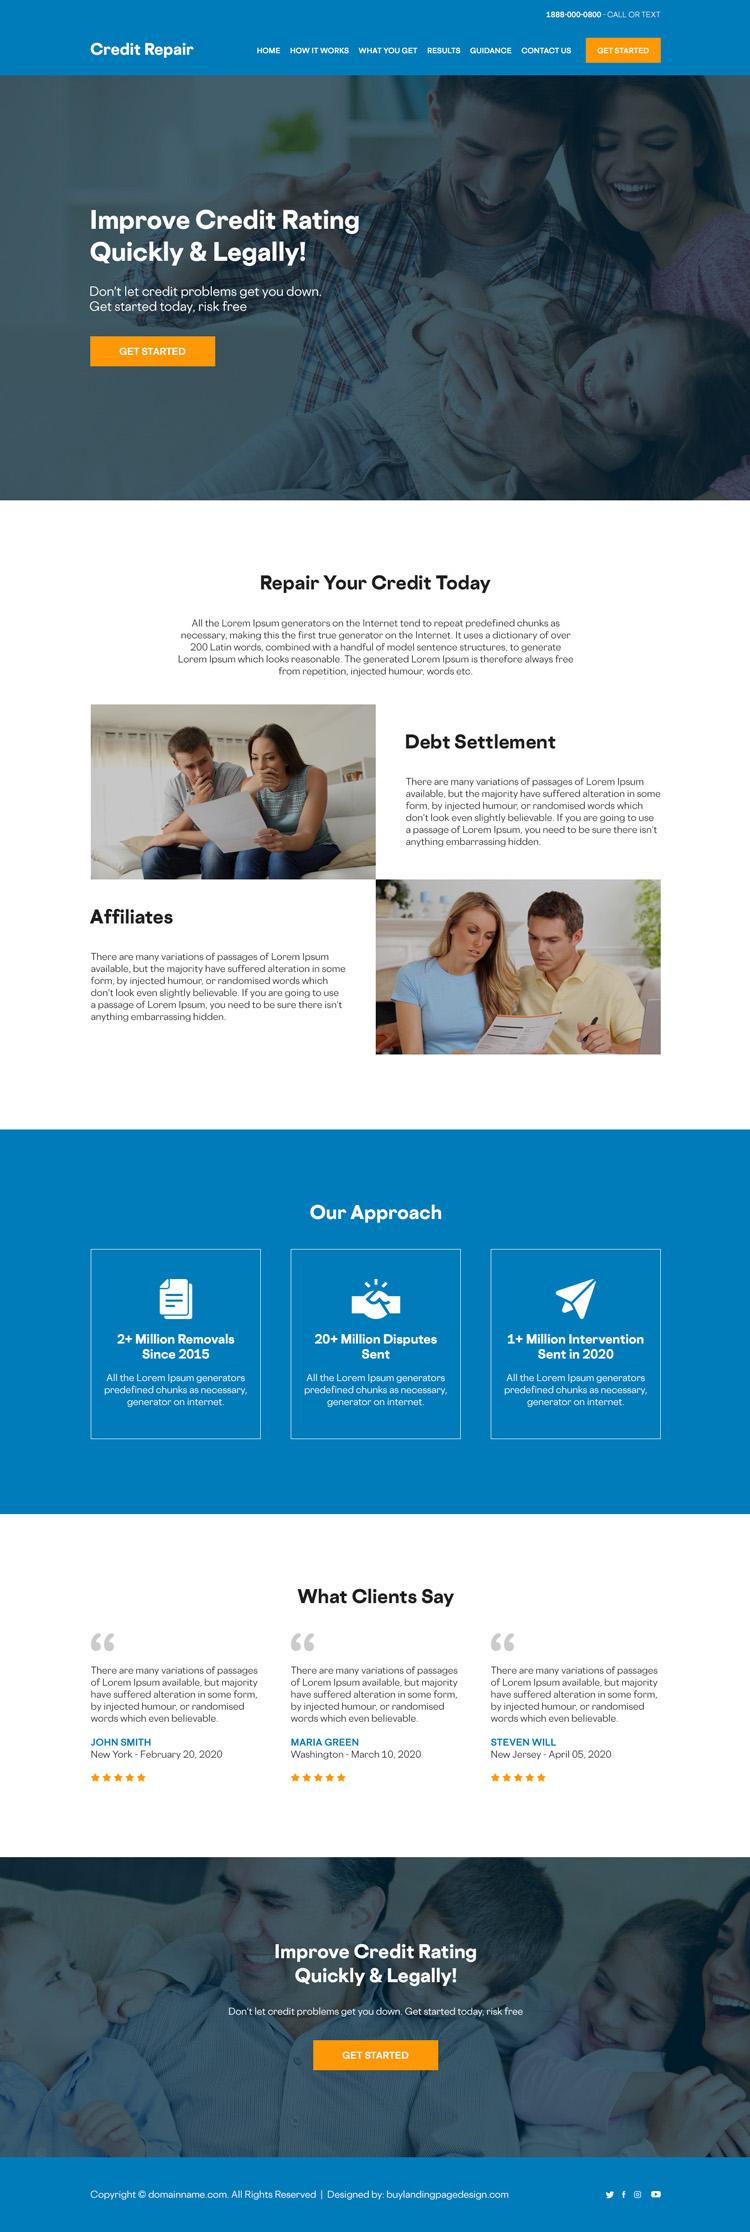 improve credit ratings quality responsive website design